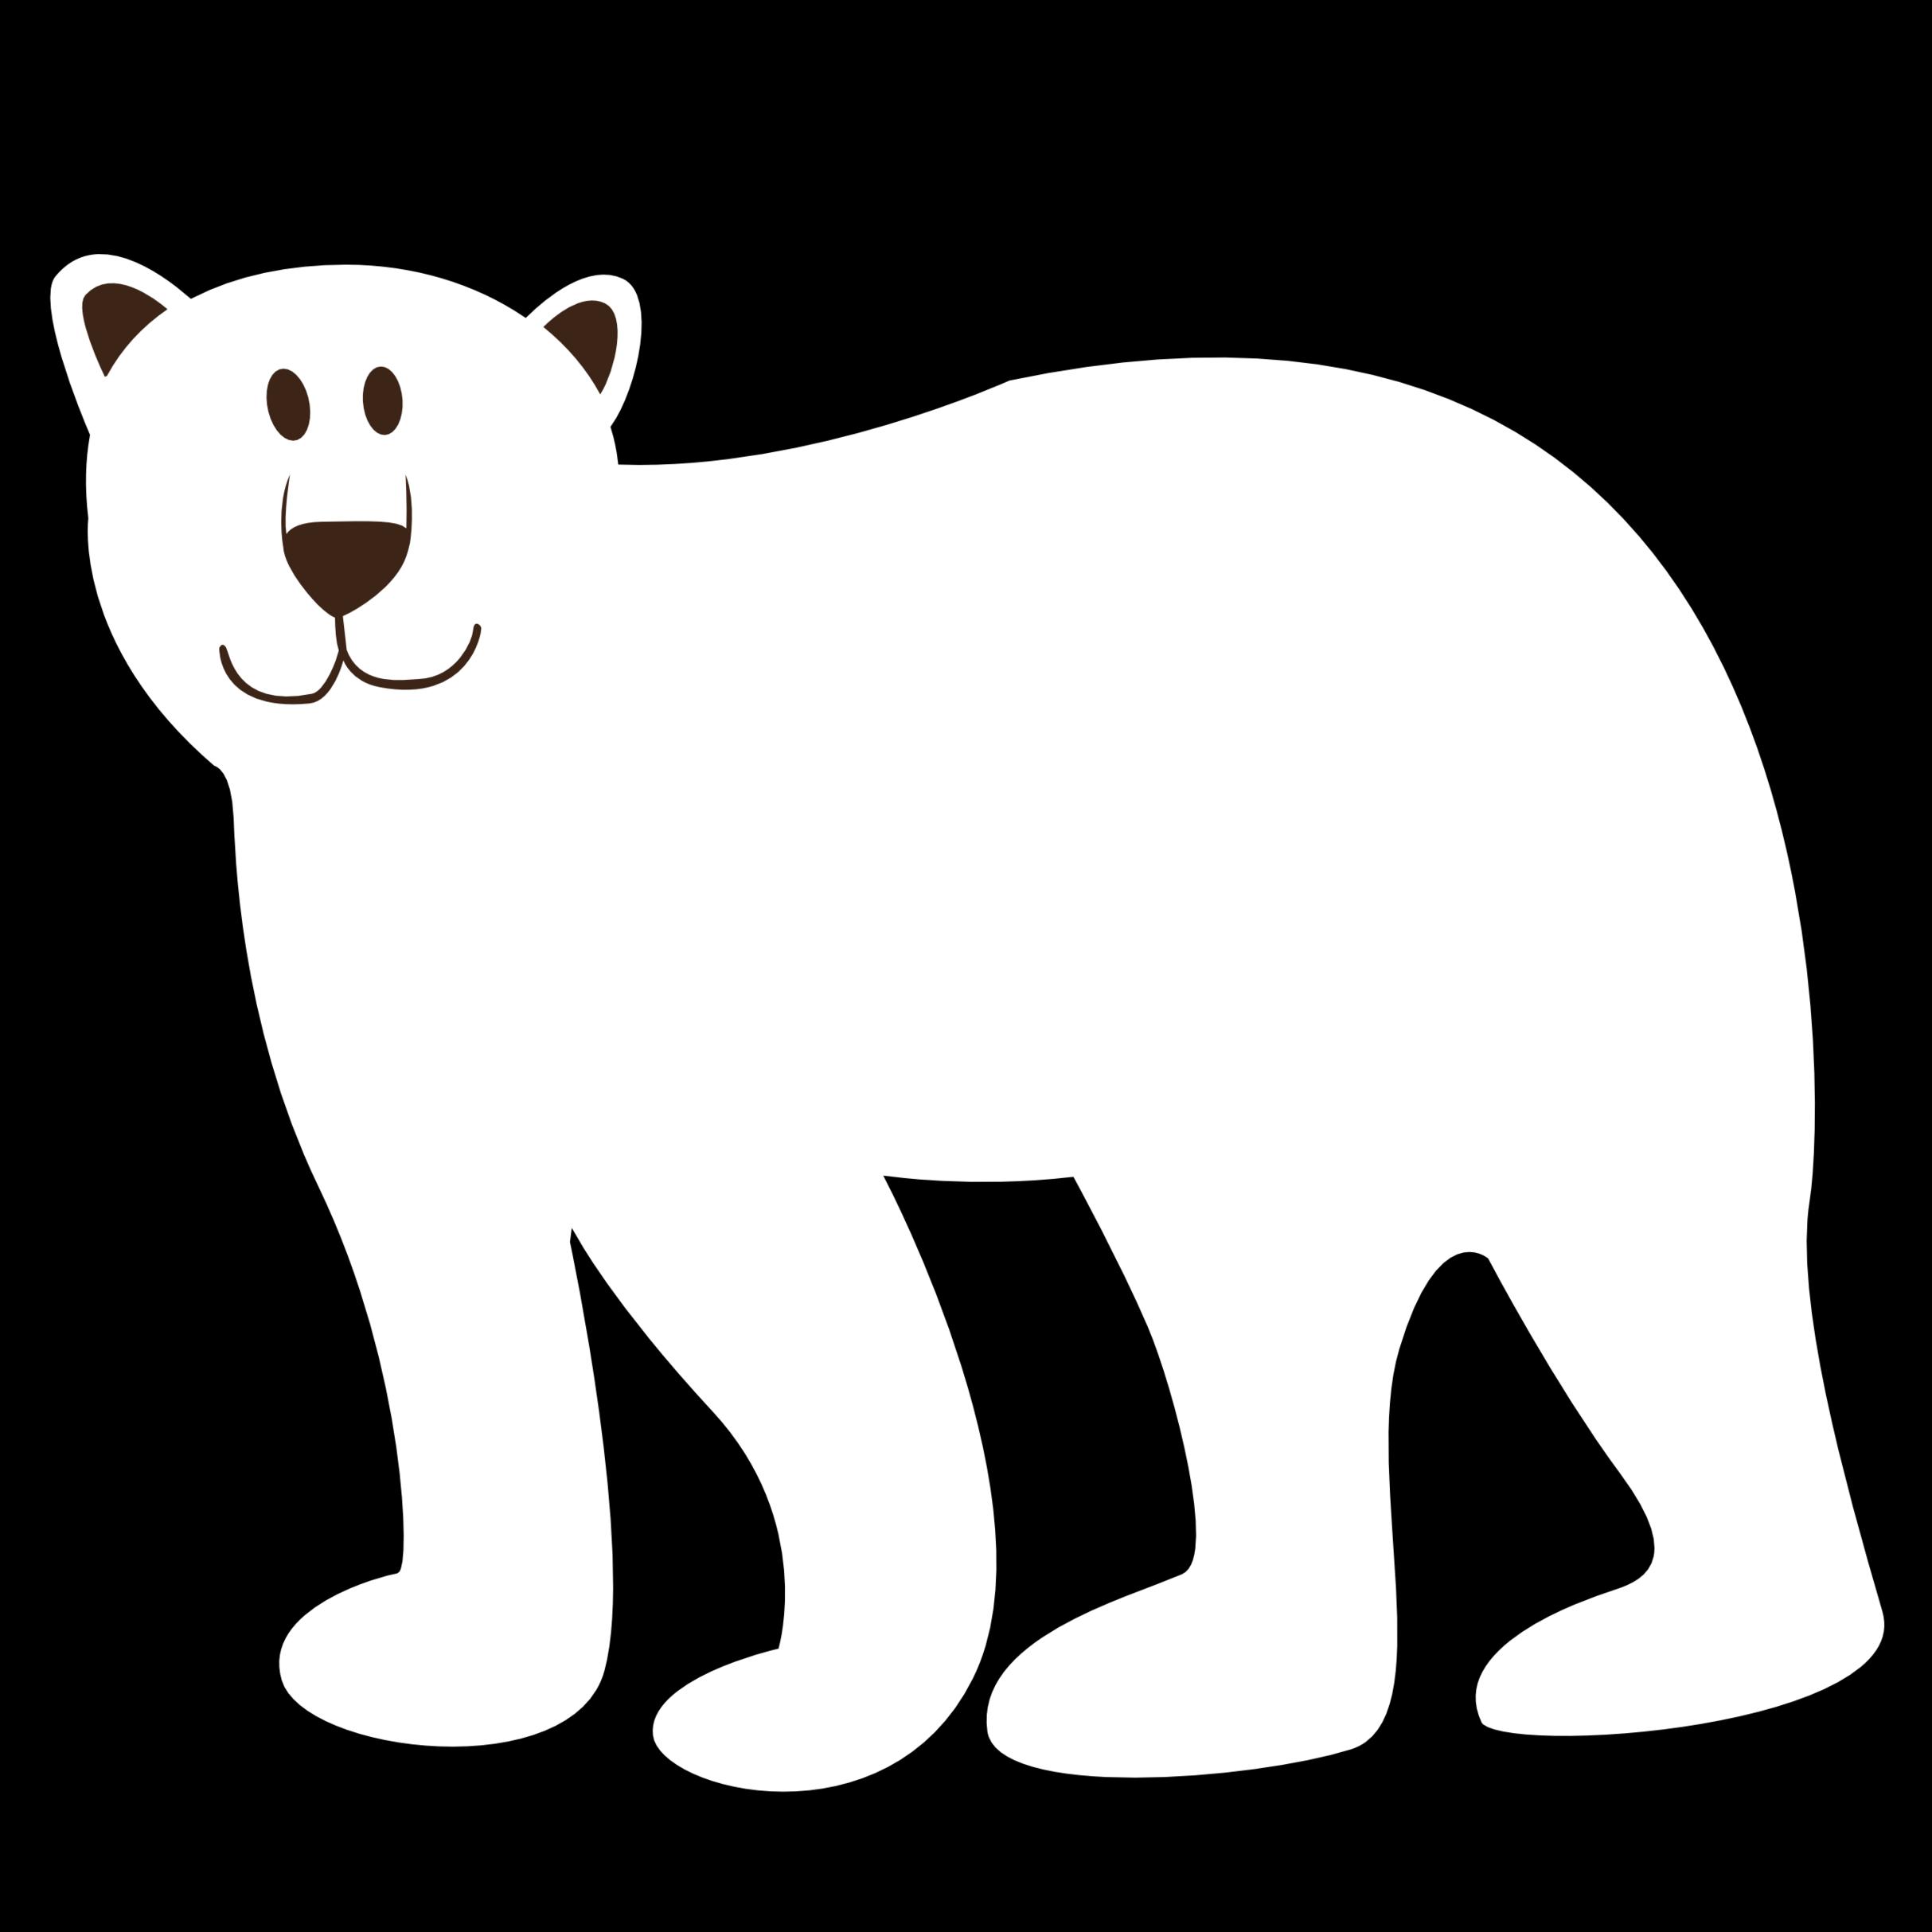 Polar bear black and white clipart vector black and white library Bear black and white polar bear black and white clipart ... vector black and white library